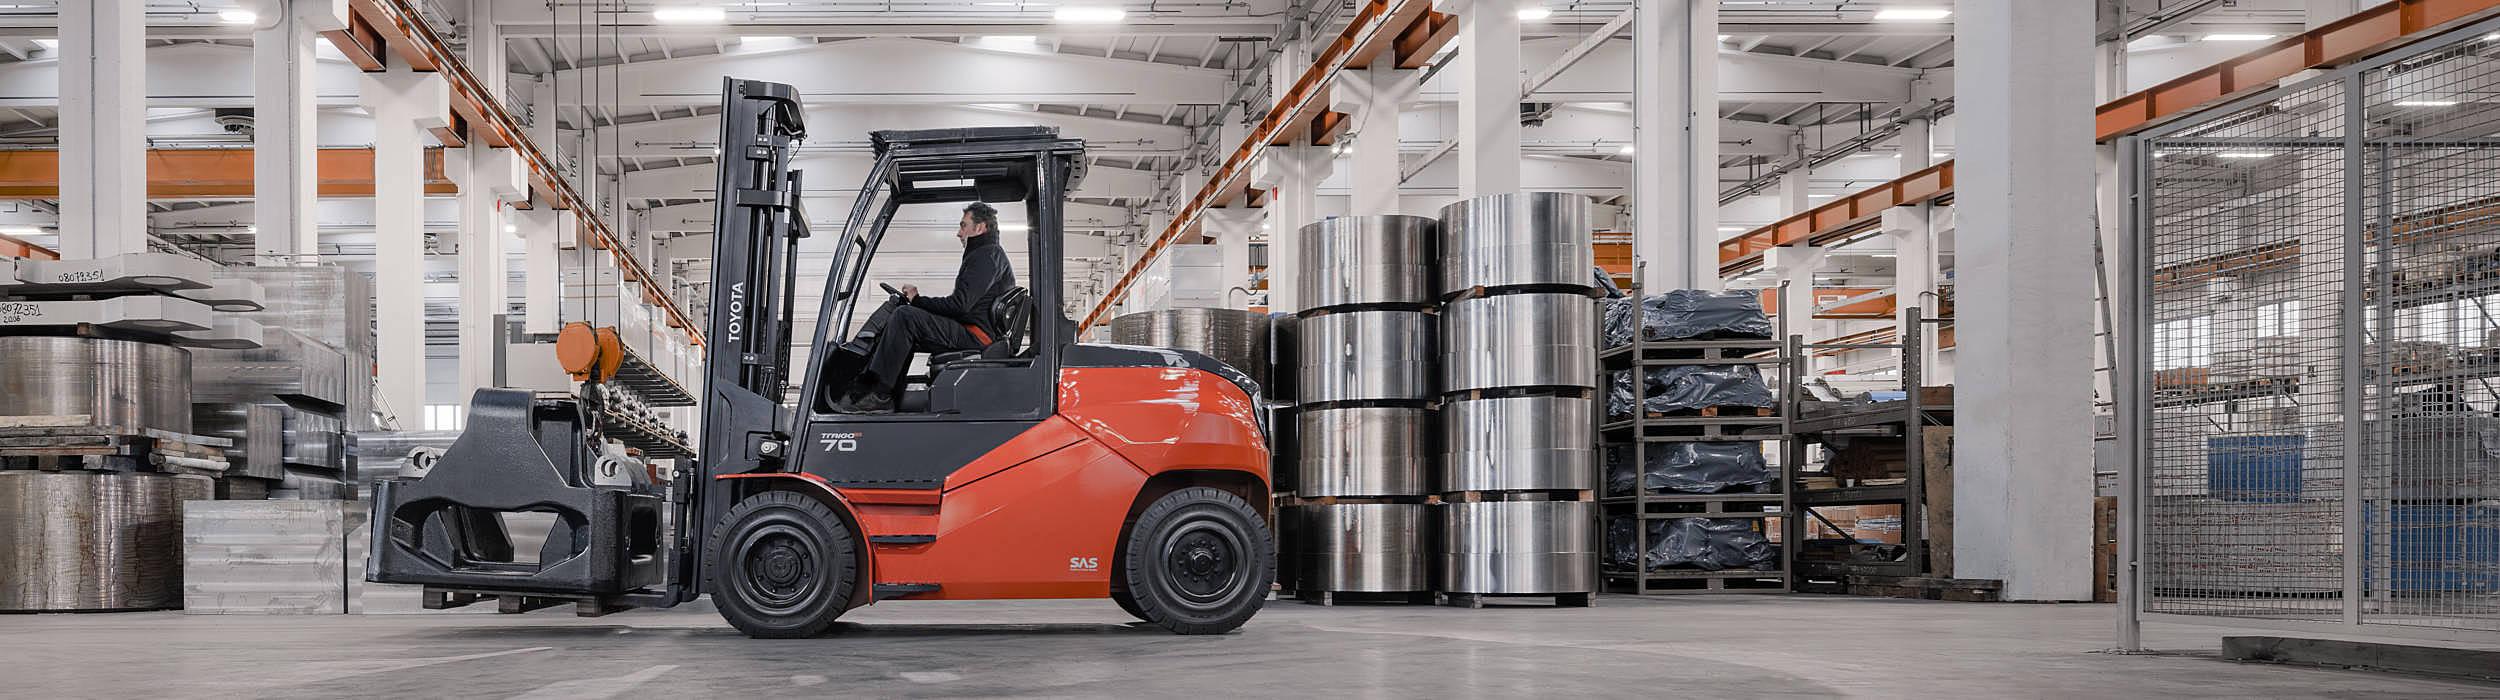 Toyota Material Handling Danmark Range